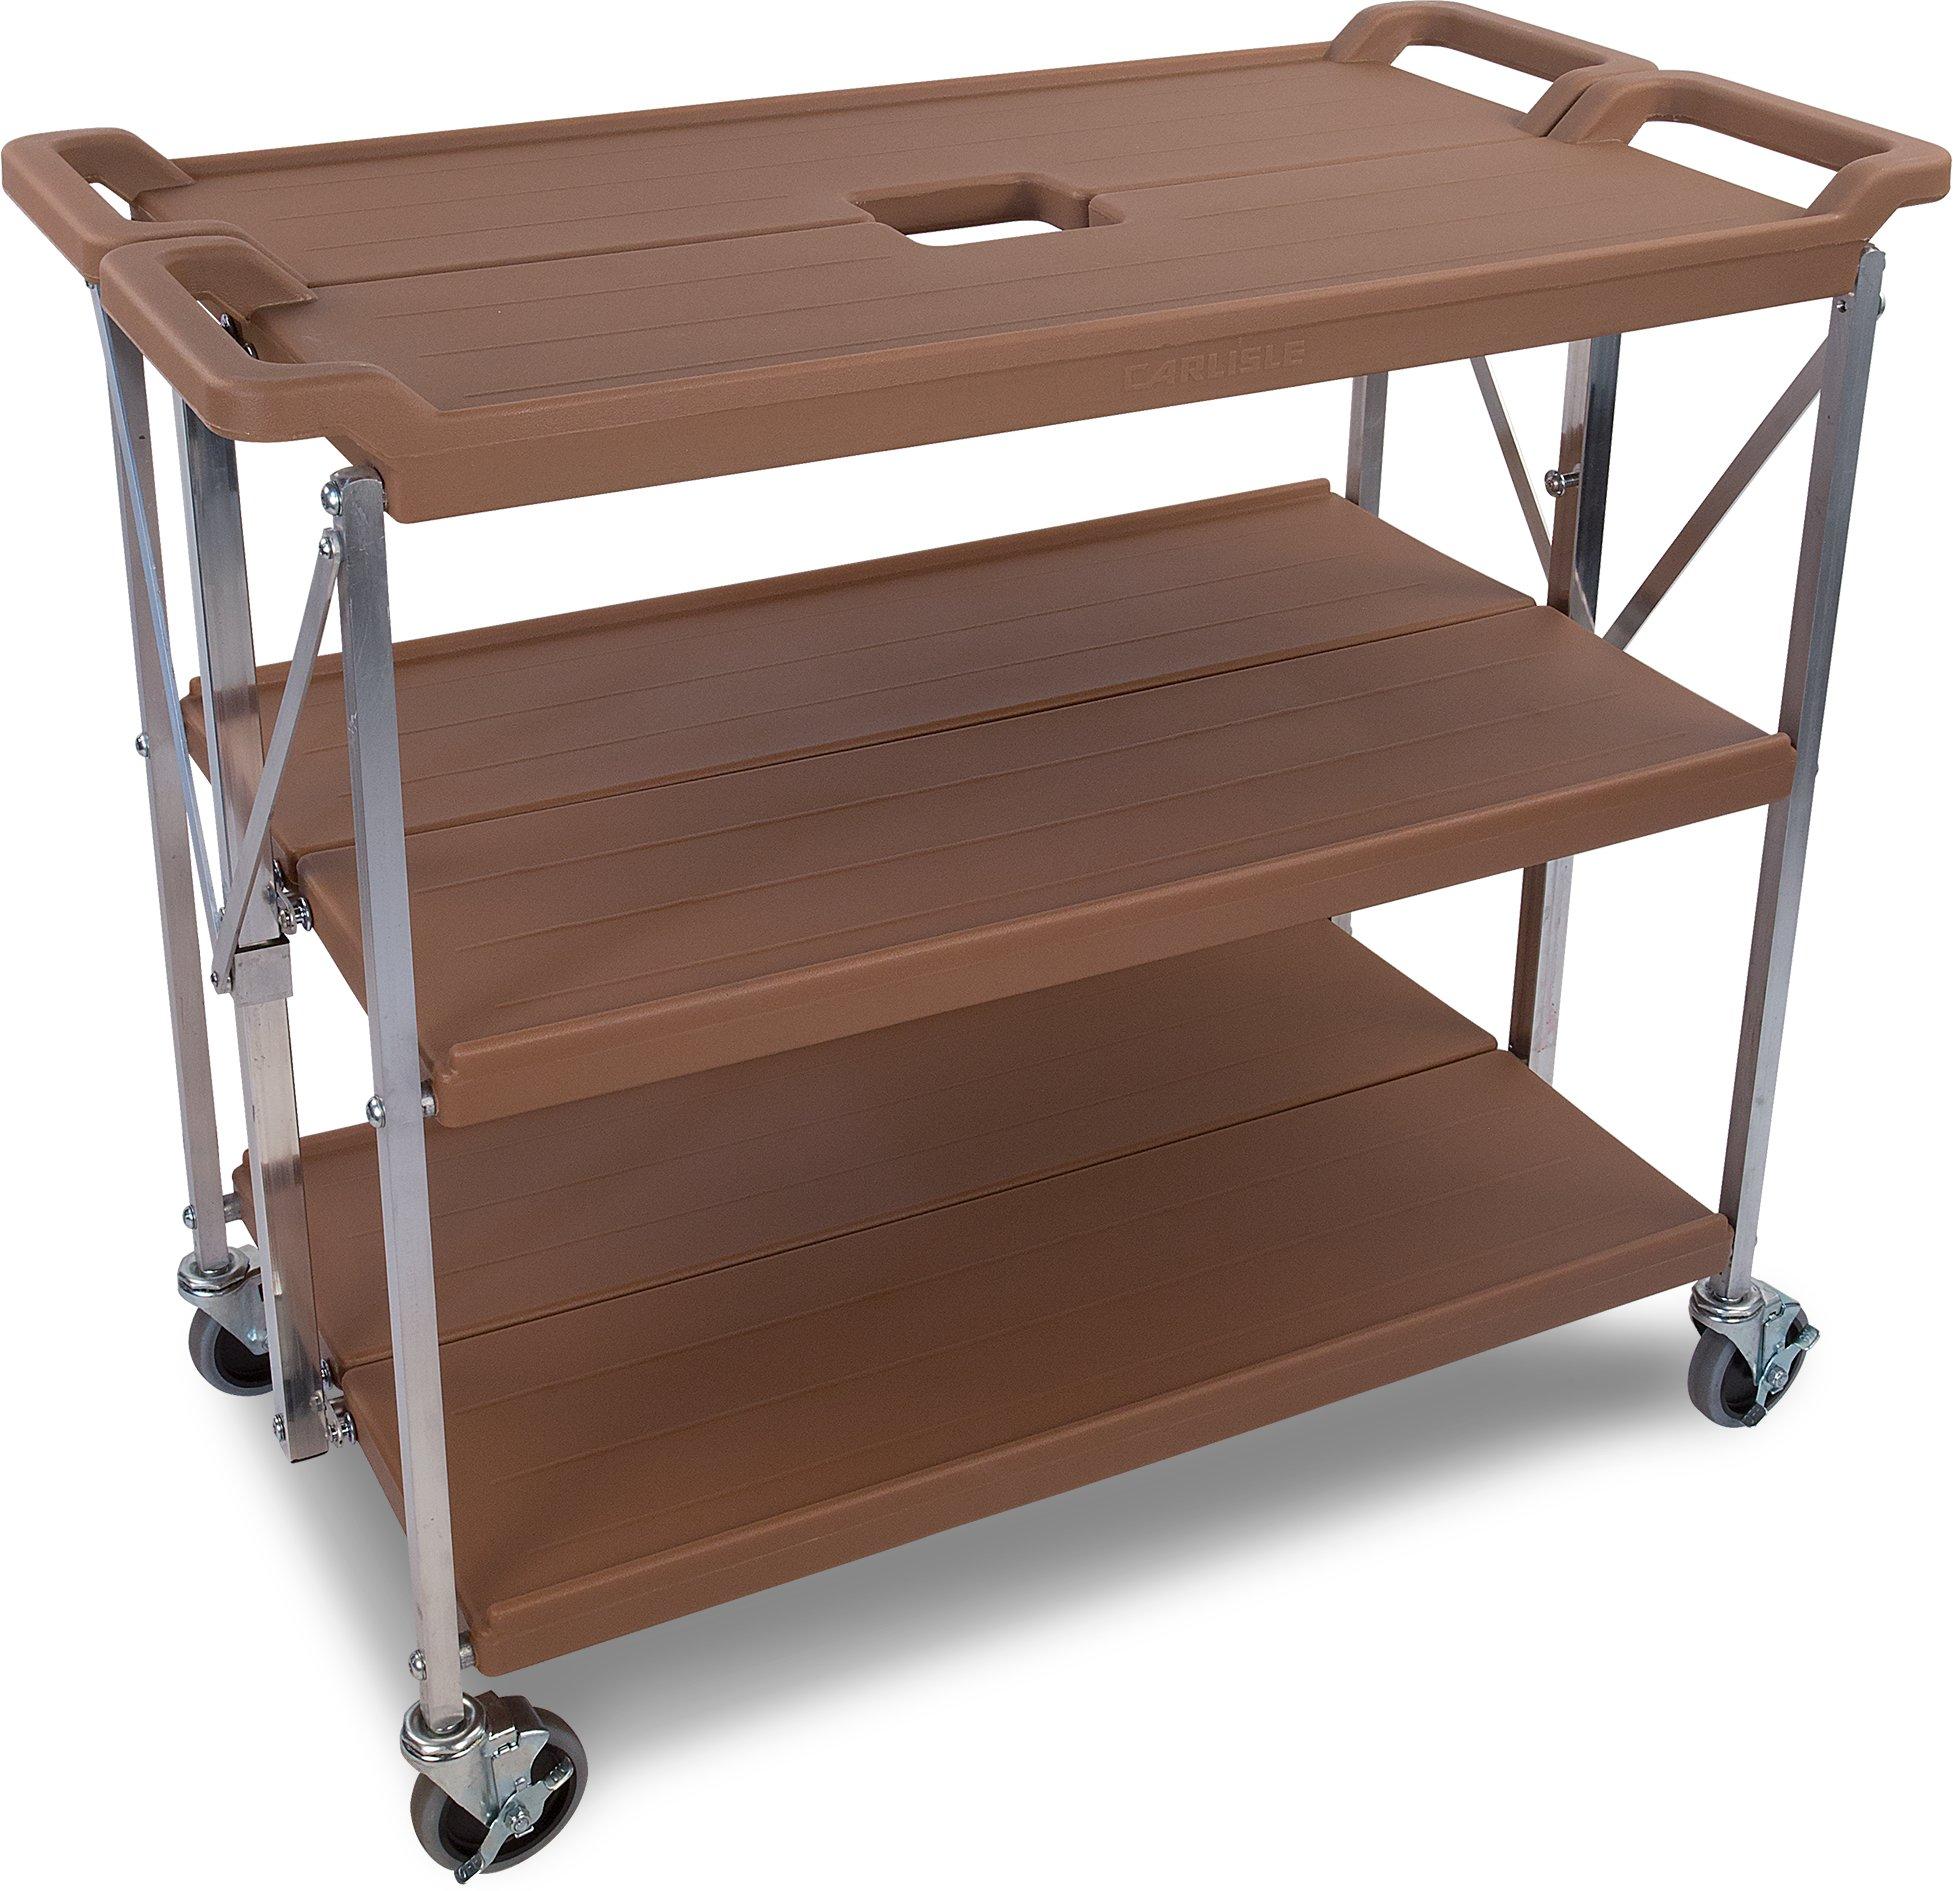 Carlisle SBC203125 Fold 'N Go Collapsible Utility Cart, 350 Pound Capacity, 31'' Length x 20'' Width Shelf, Tan